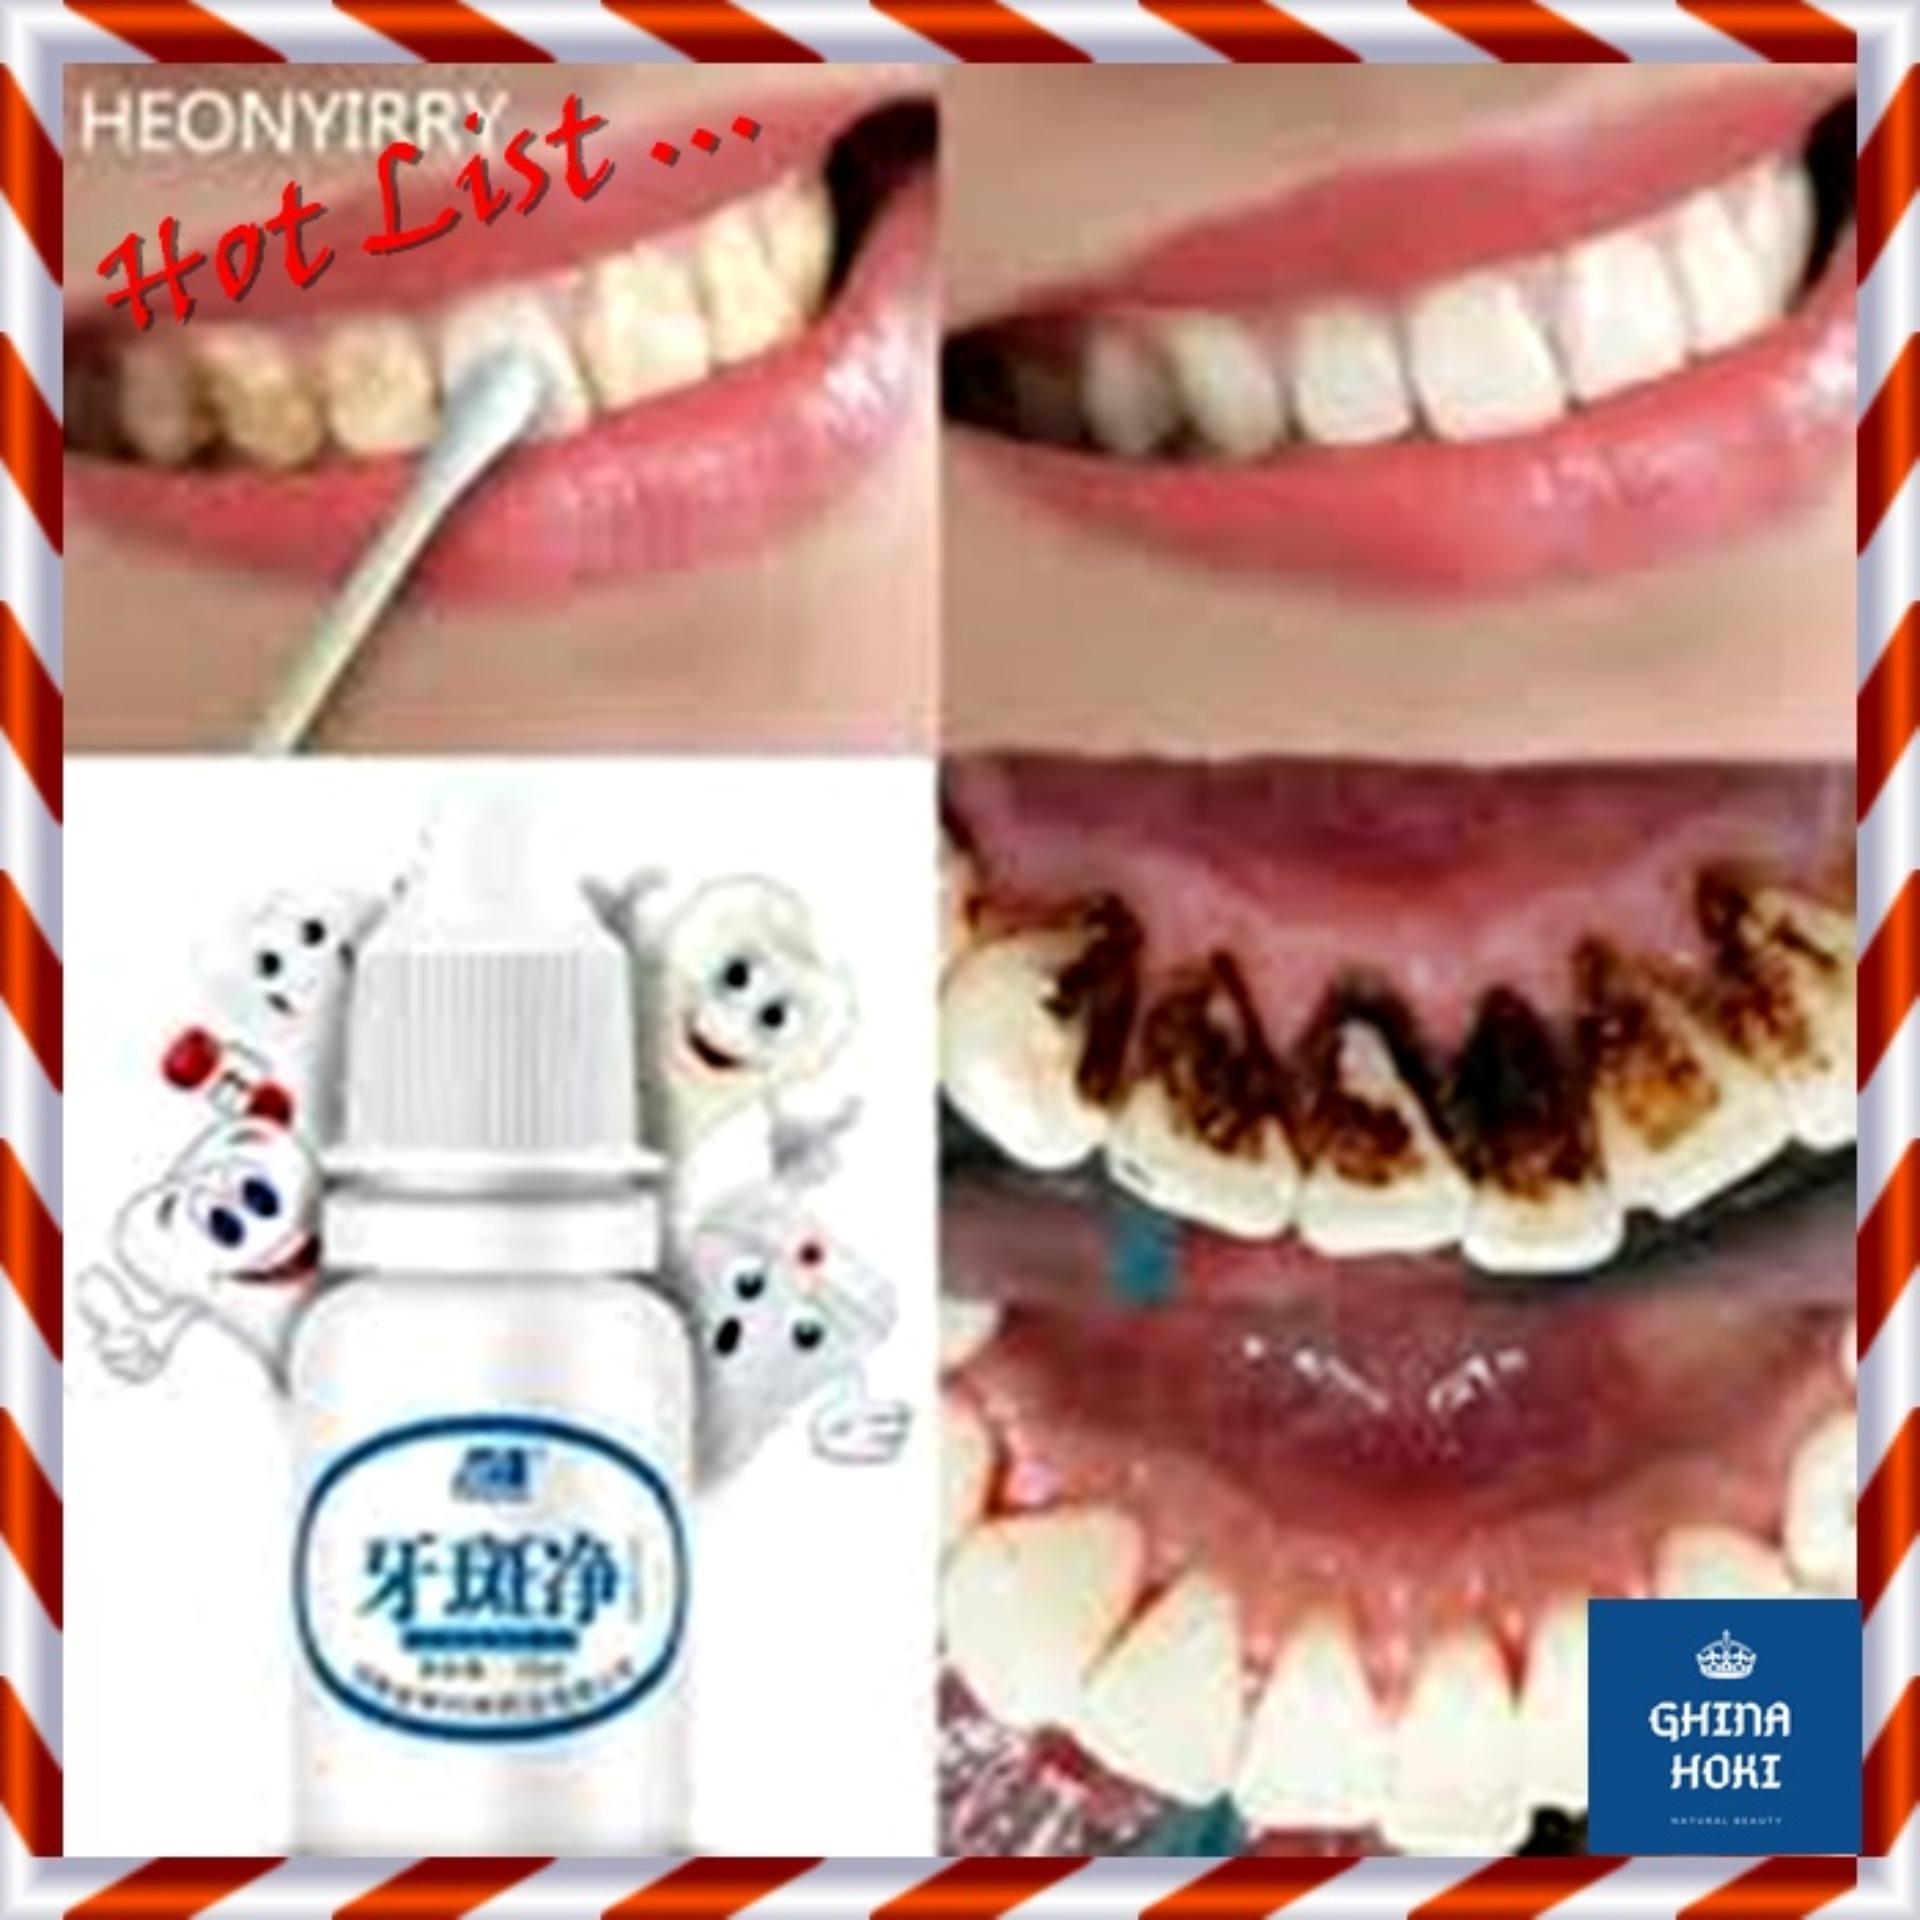 Pemutih Gigi   Penghancur Karang Gigi (teeth whitening bath) Obat impor  dari Cina Pembersih Gigi da26f966dc